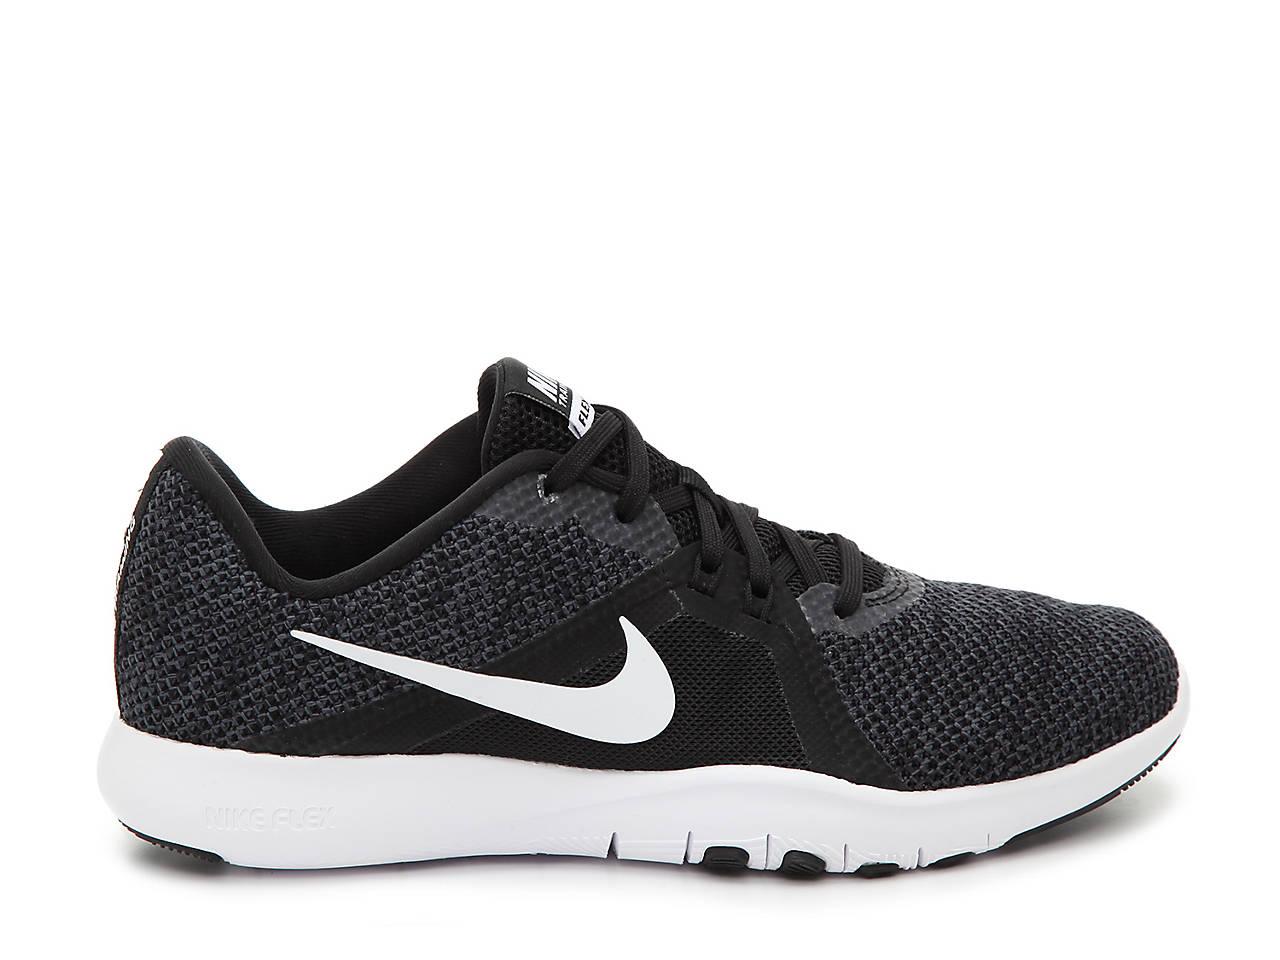 52bde849d0aa Nike Flex TR 8 Lightweight Training Shoe - Women s Women s Shoes